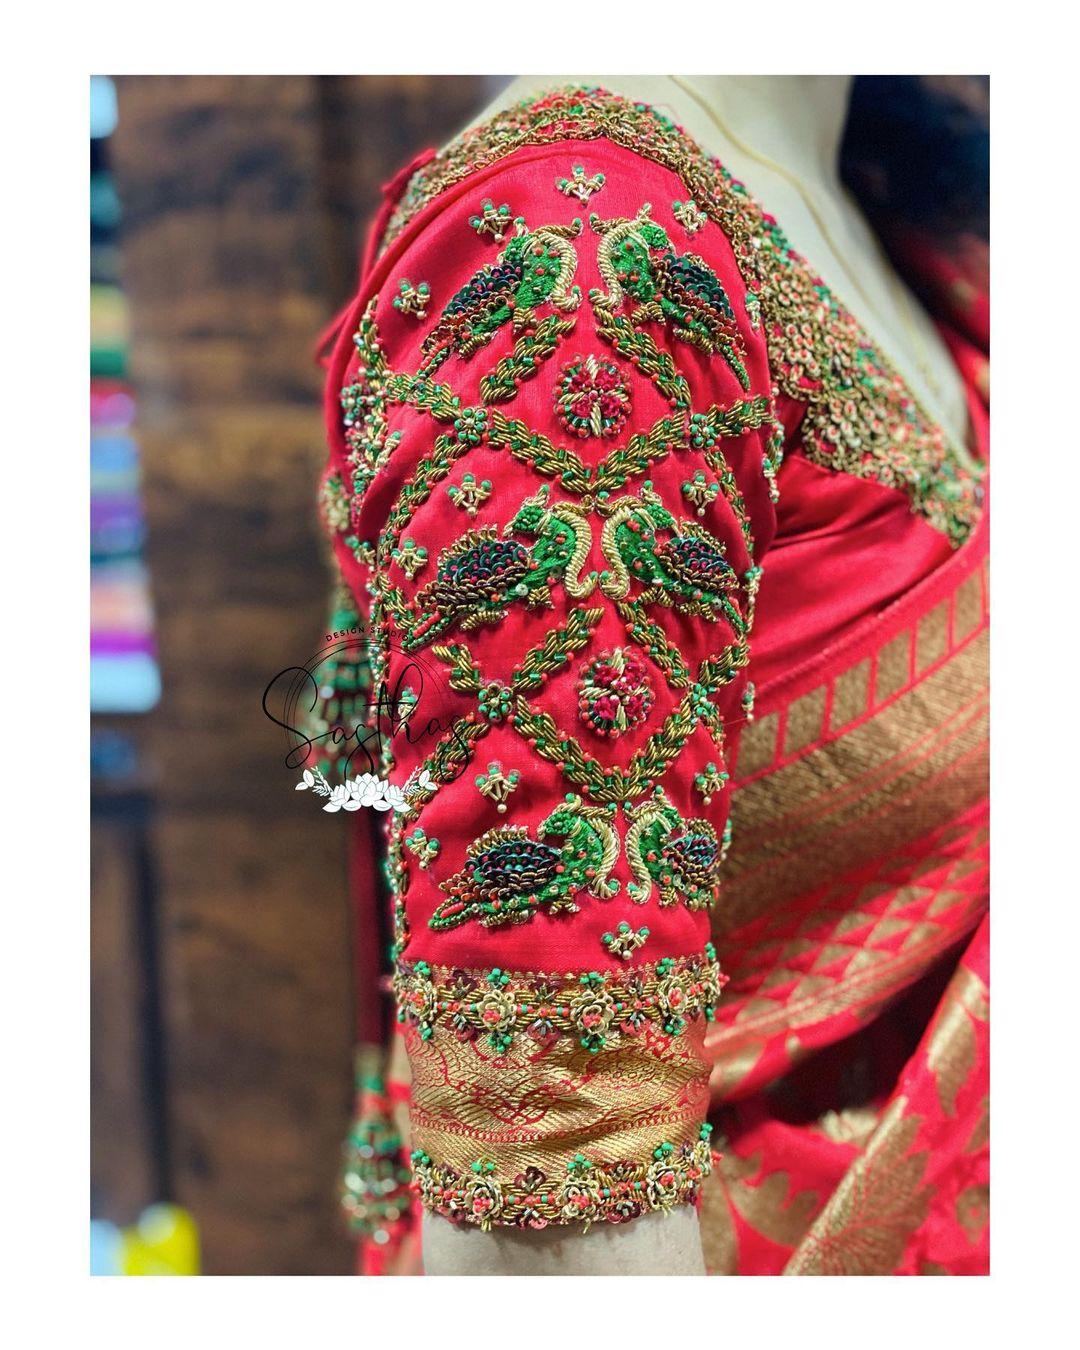 Stunning red bridal blouse sleeve with peacock benedictory aari work on sleeves.  2021-06-10